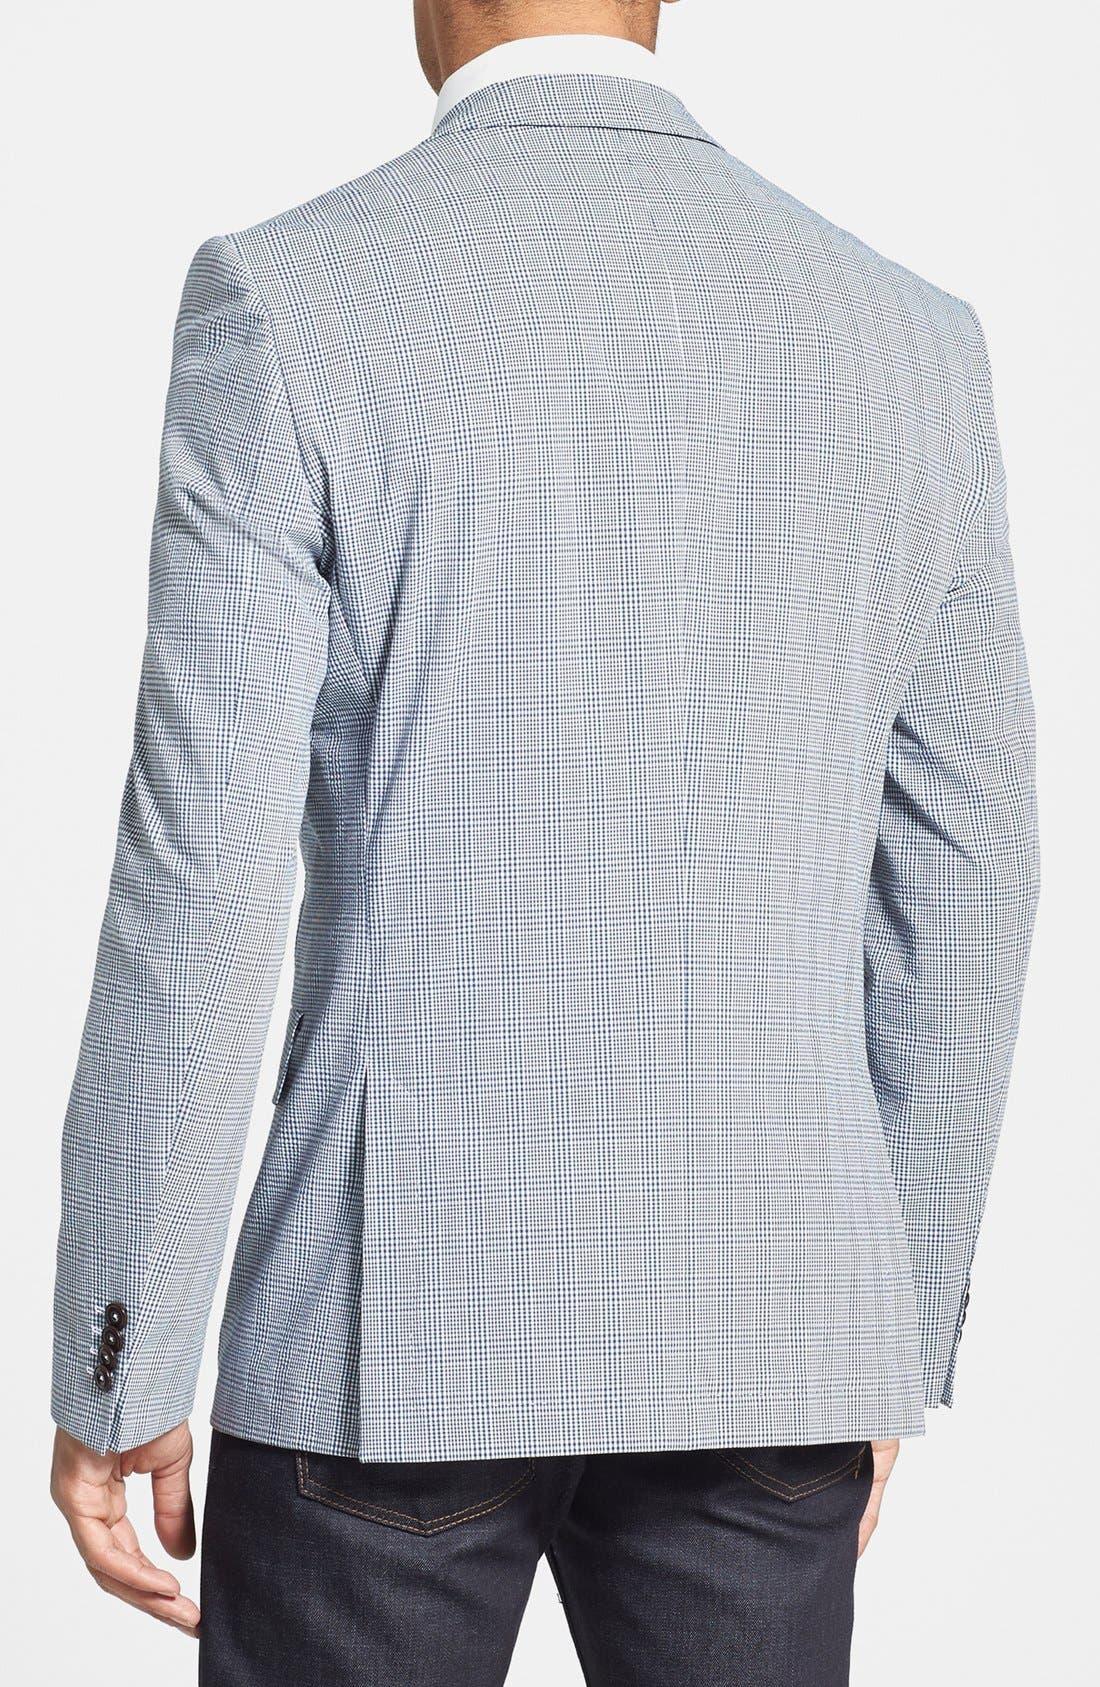 Alternate Image 2  - BOSS HUGO BOSS 'Noris' Trim Fit Plaid Sportcoat